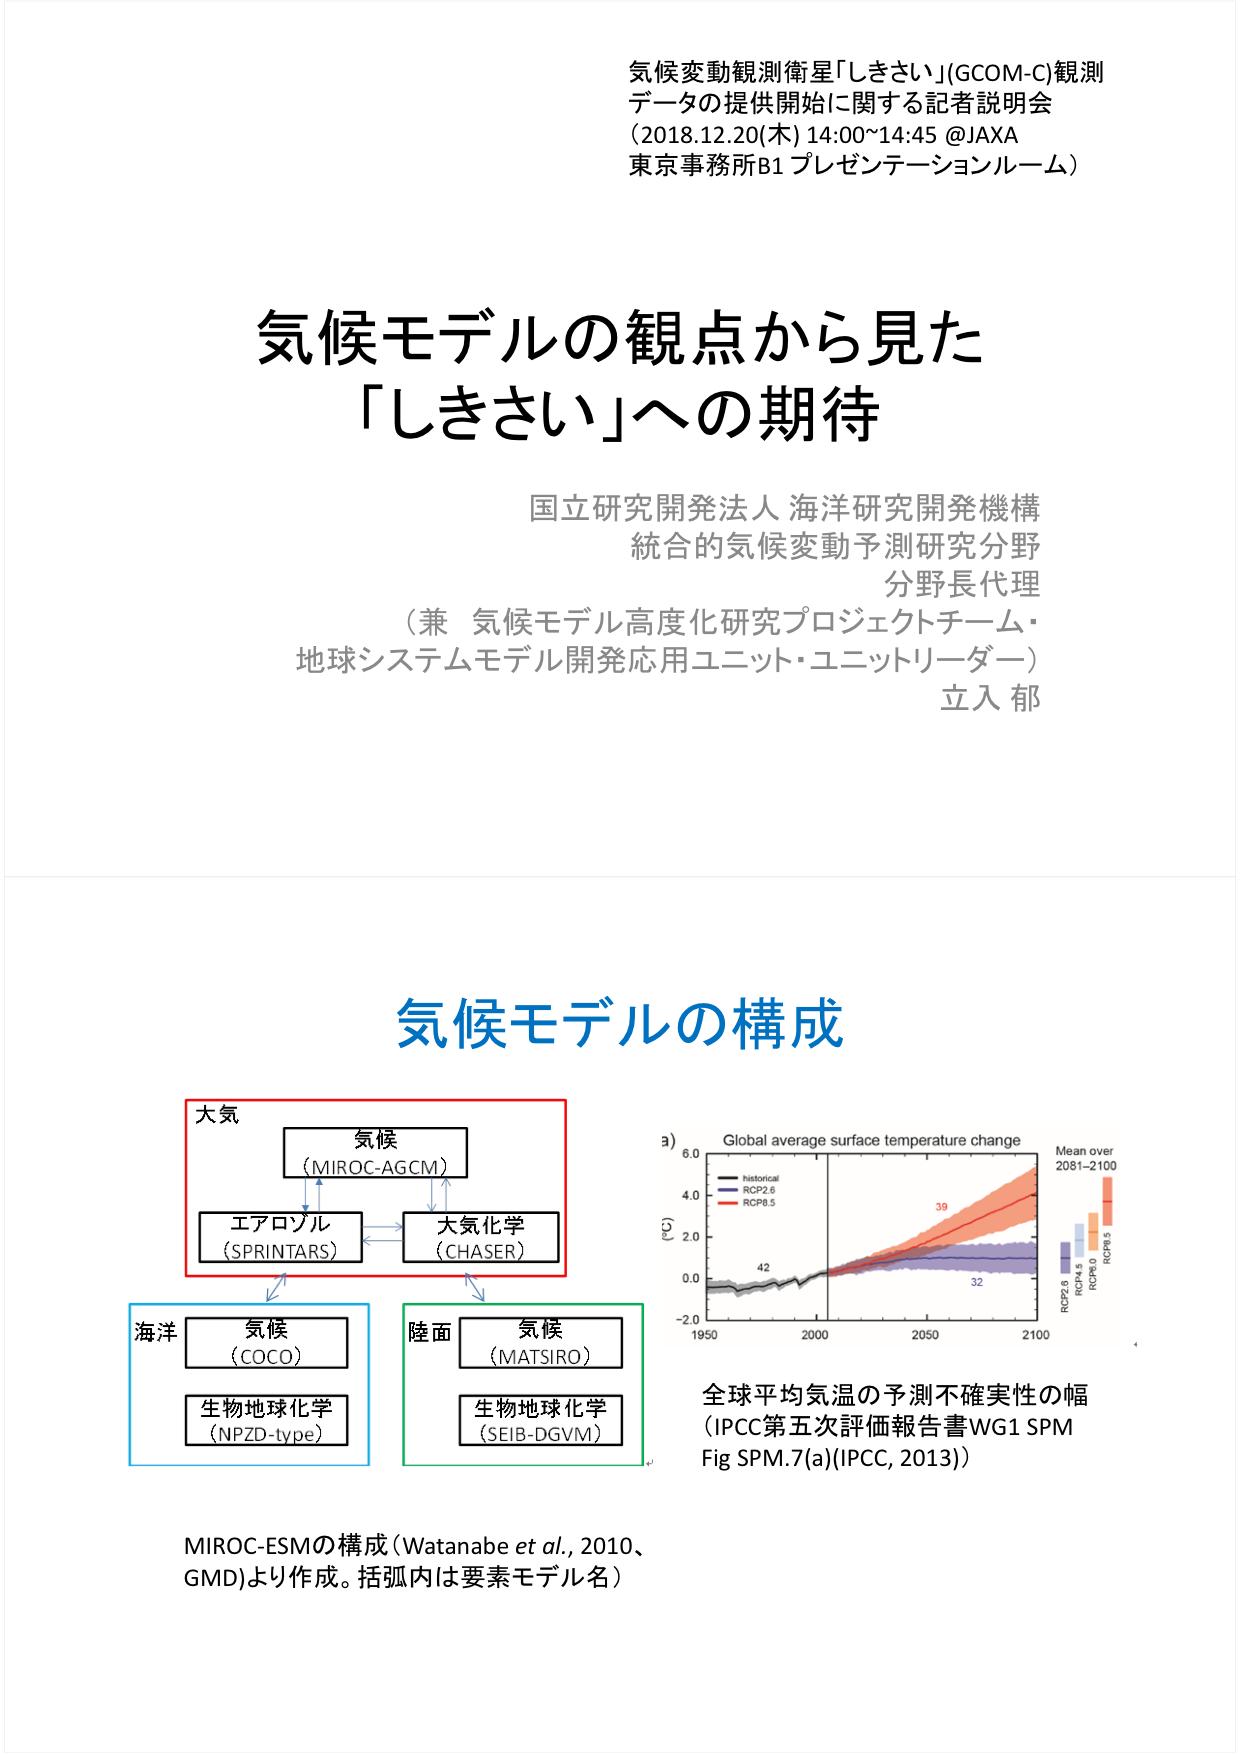 f:id:Imamura:20181220152519p:plain